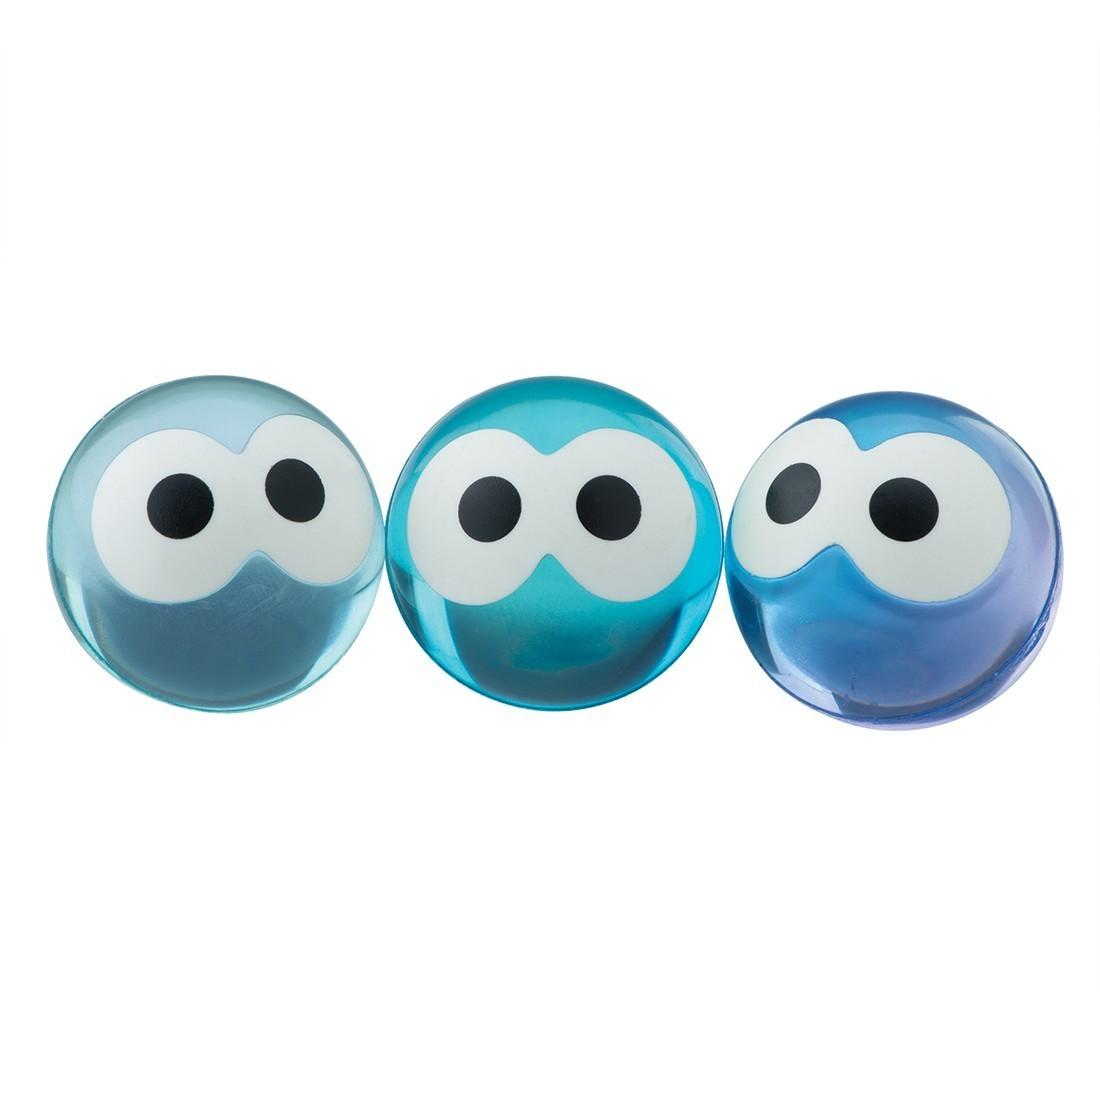 29mm Two-Tone Eyeball Bouncing Balls [image]